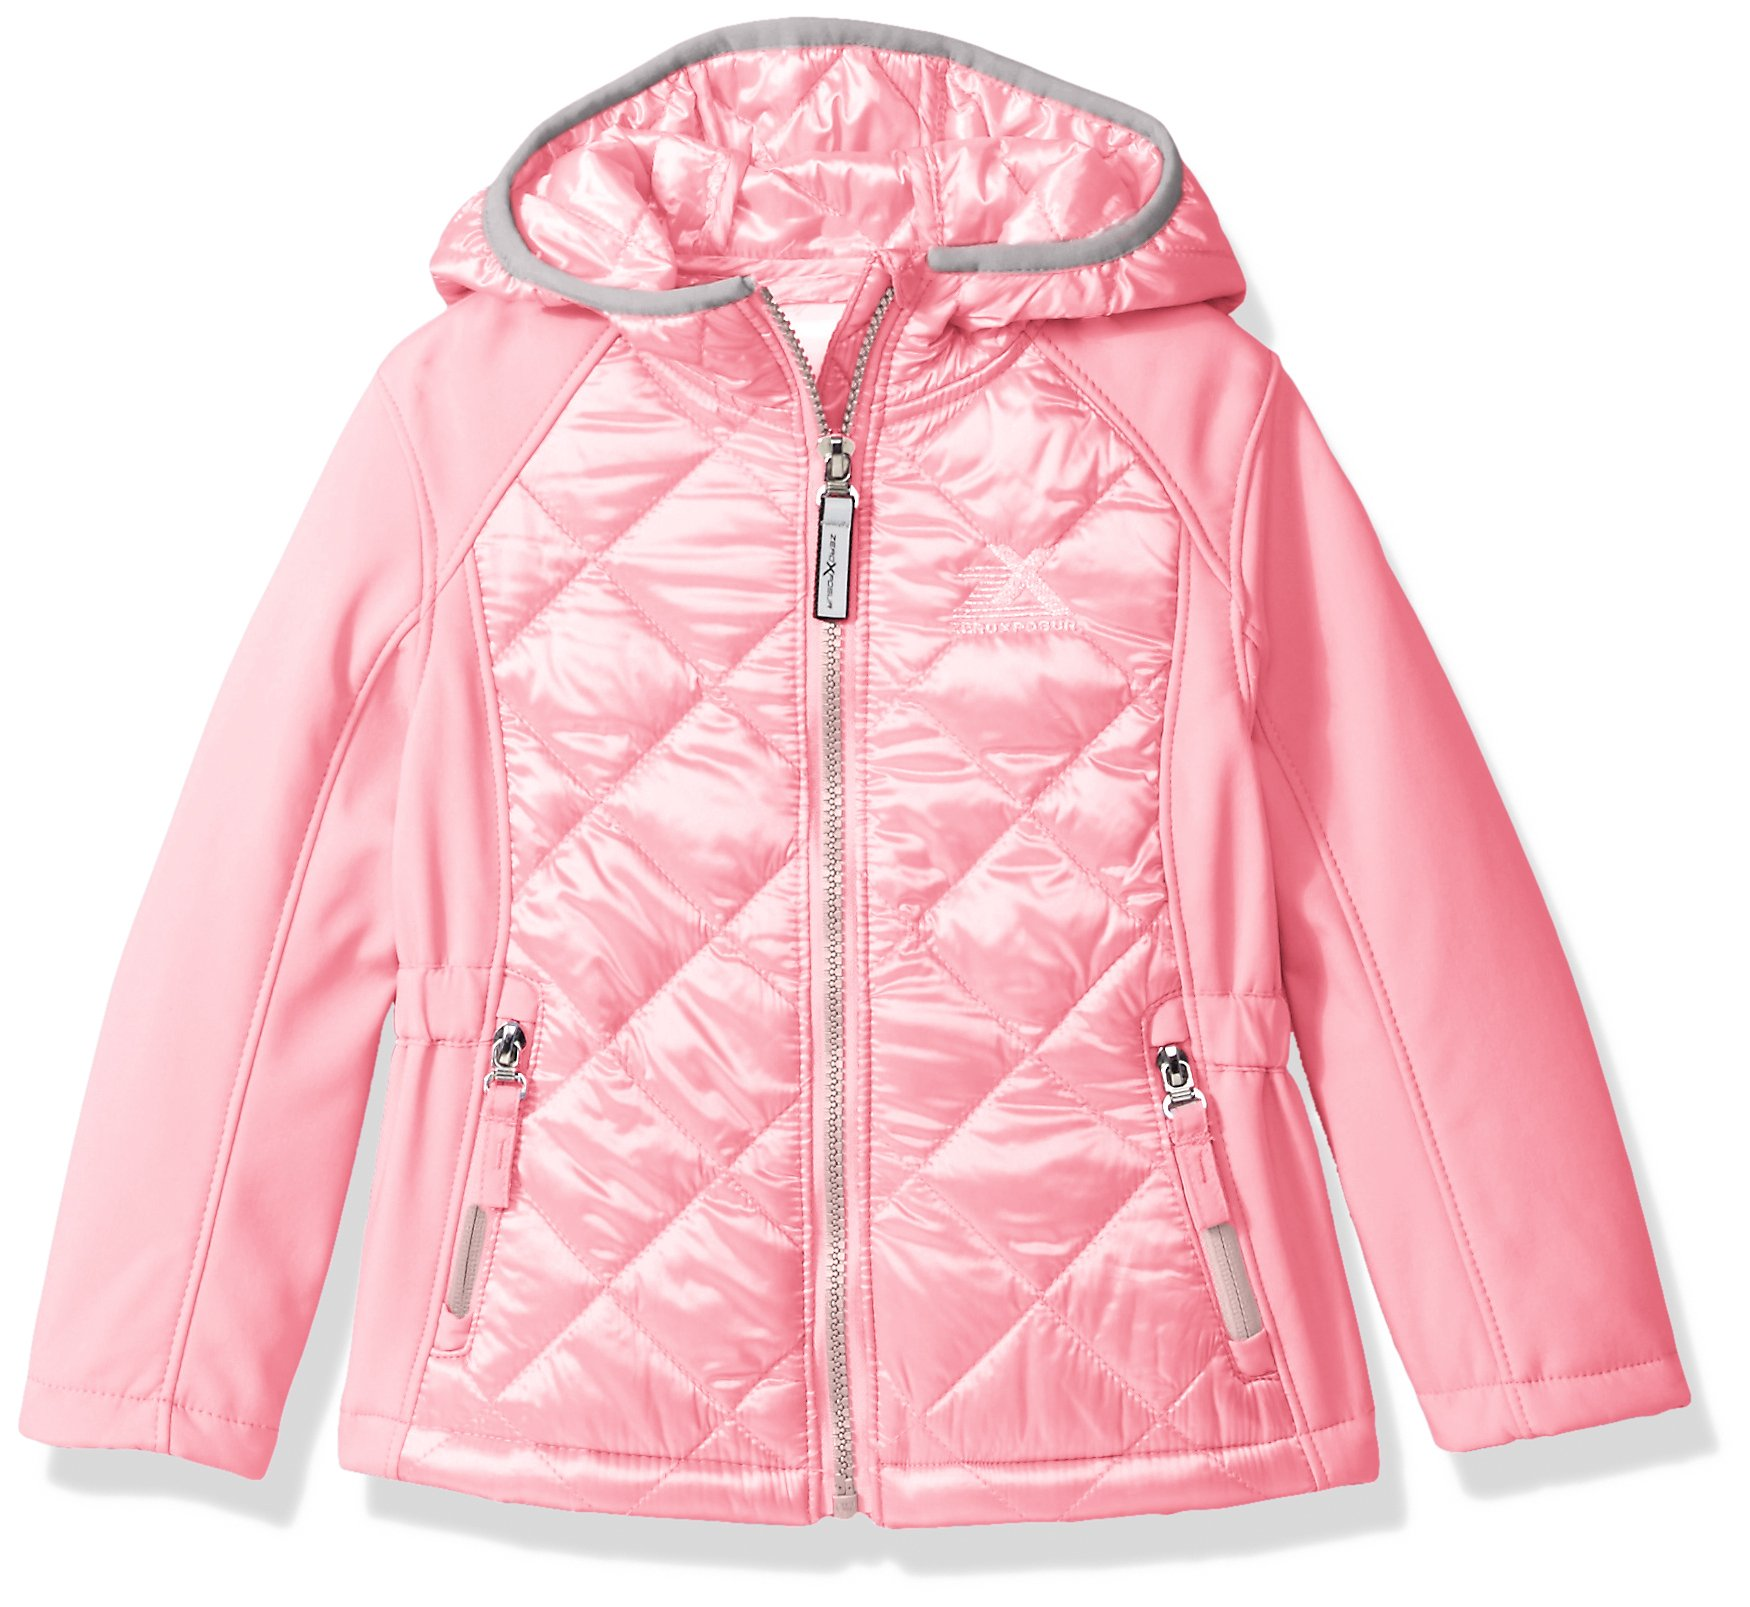 ZeroXposur Toddler Girls' Eleanor Transitional Jacket, Lipstick, 2T